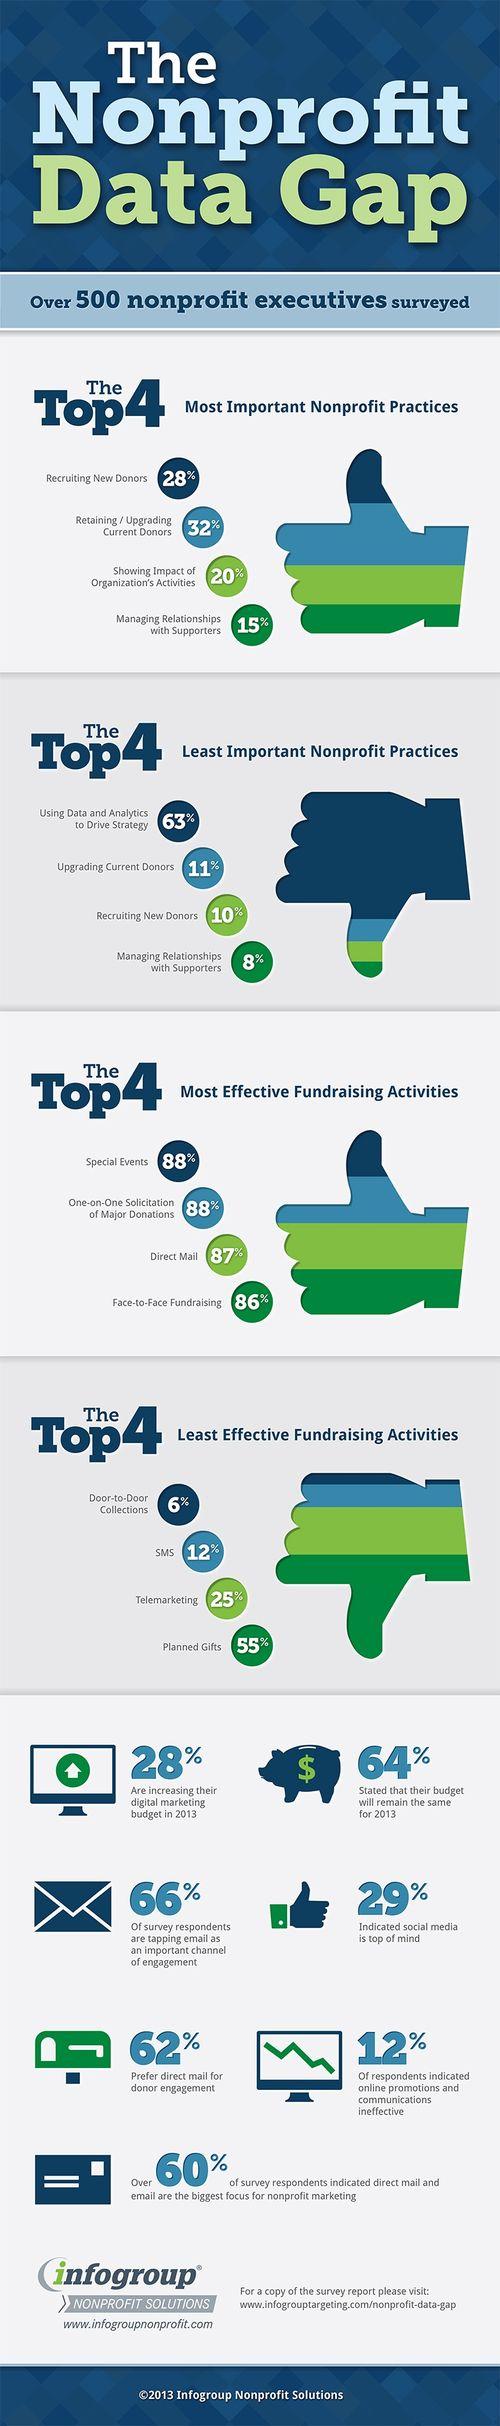 Infographic_NonprofitDataGap